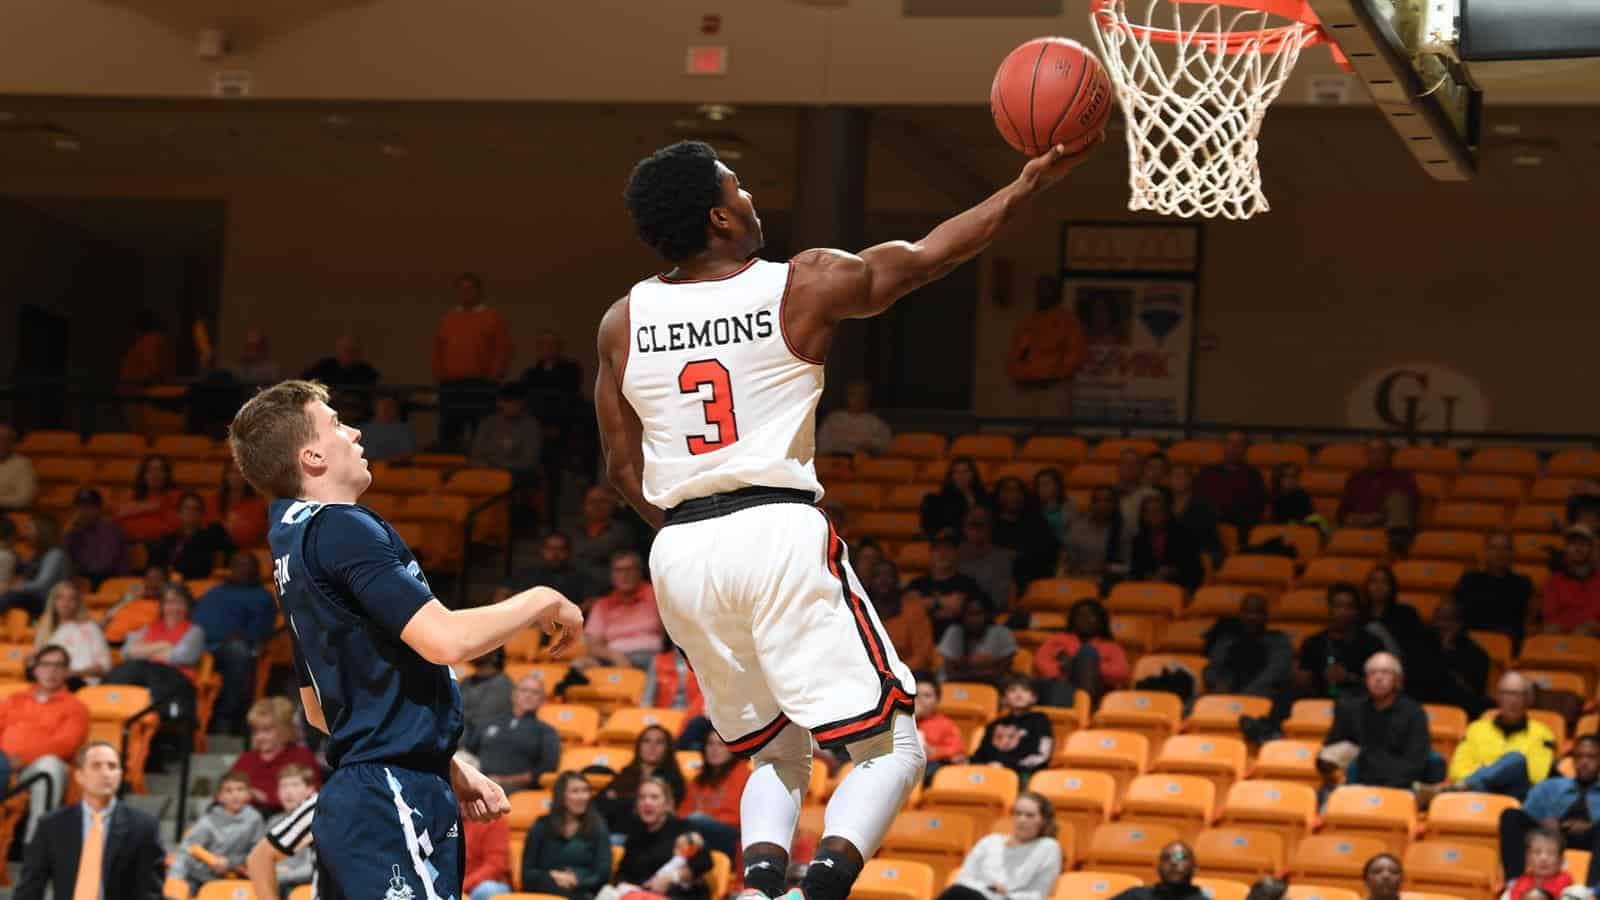 BasketballNcaa - Campbell - Chris Clemons